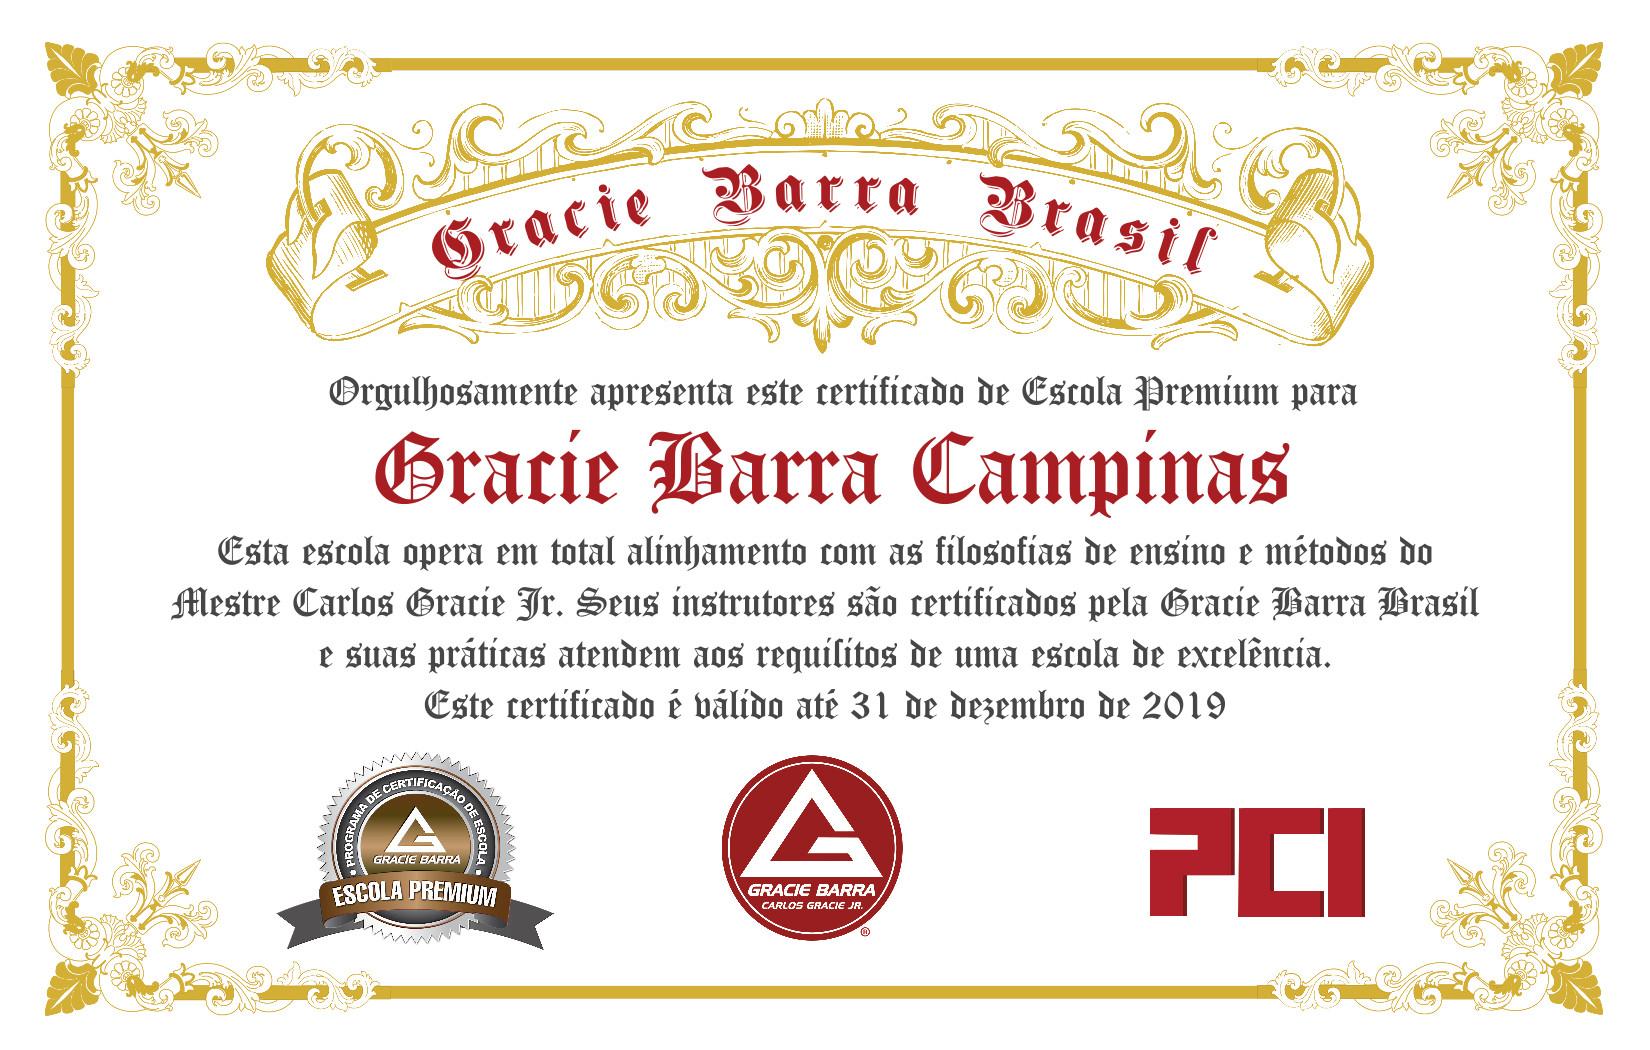 Gracie Barra Campinas - Escola Premium